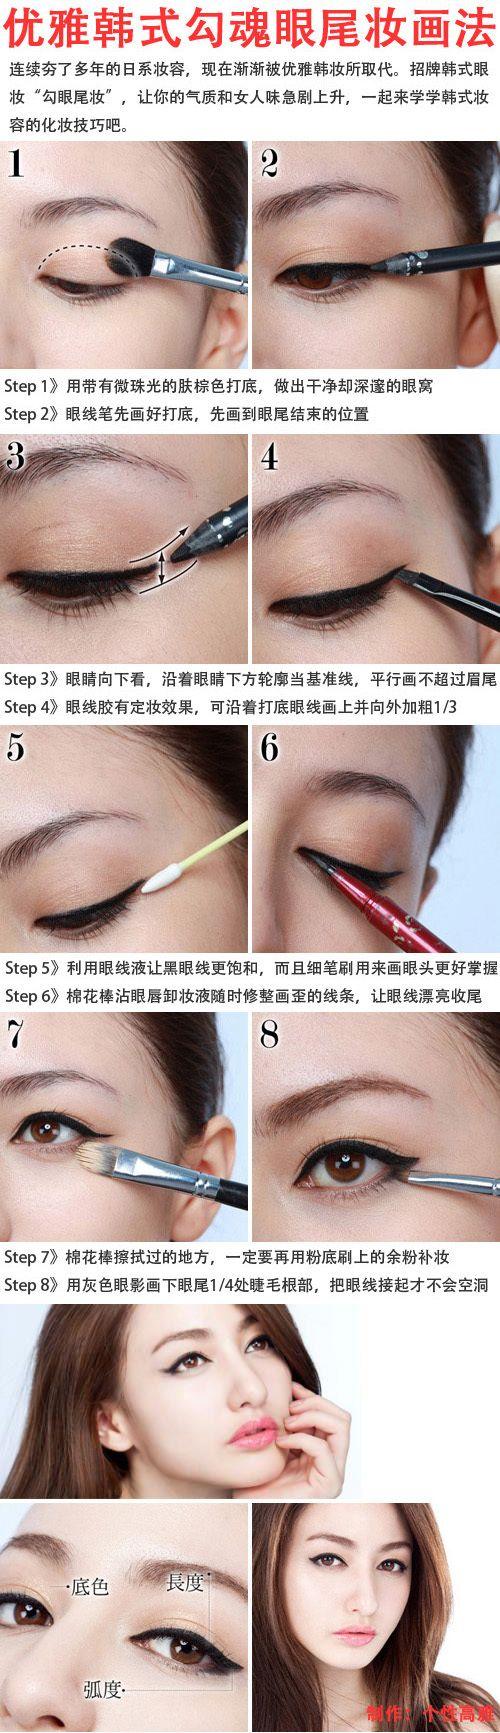 japanese/korean make up tutorial ⭐️ #JoinNerium #DebbieKrug #NeriumKorea www.RadiantFitAndHappy.com